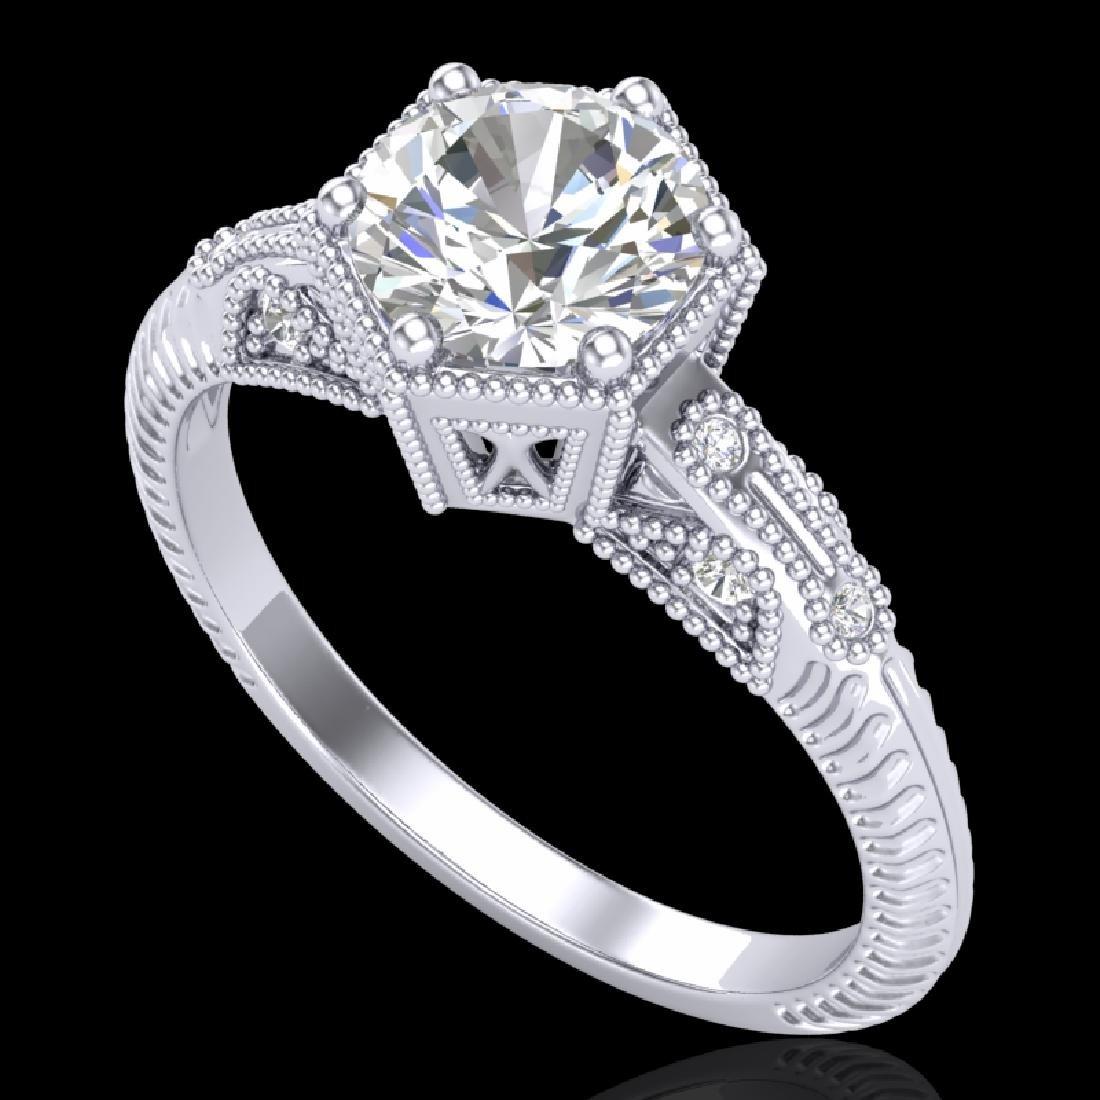 1.17 CTW VS/SI Diamond Solitaire Art Deco Ring 18K